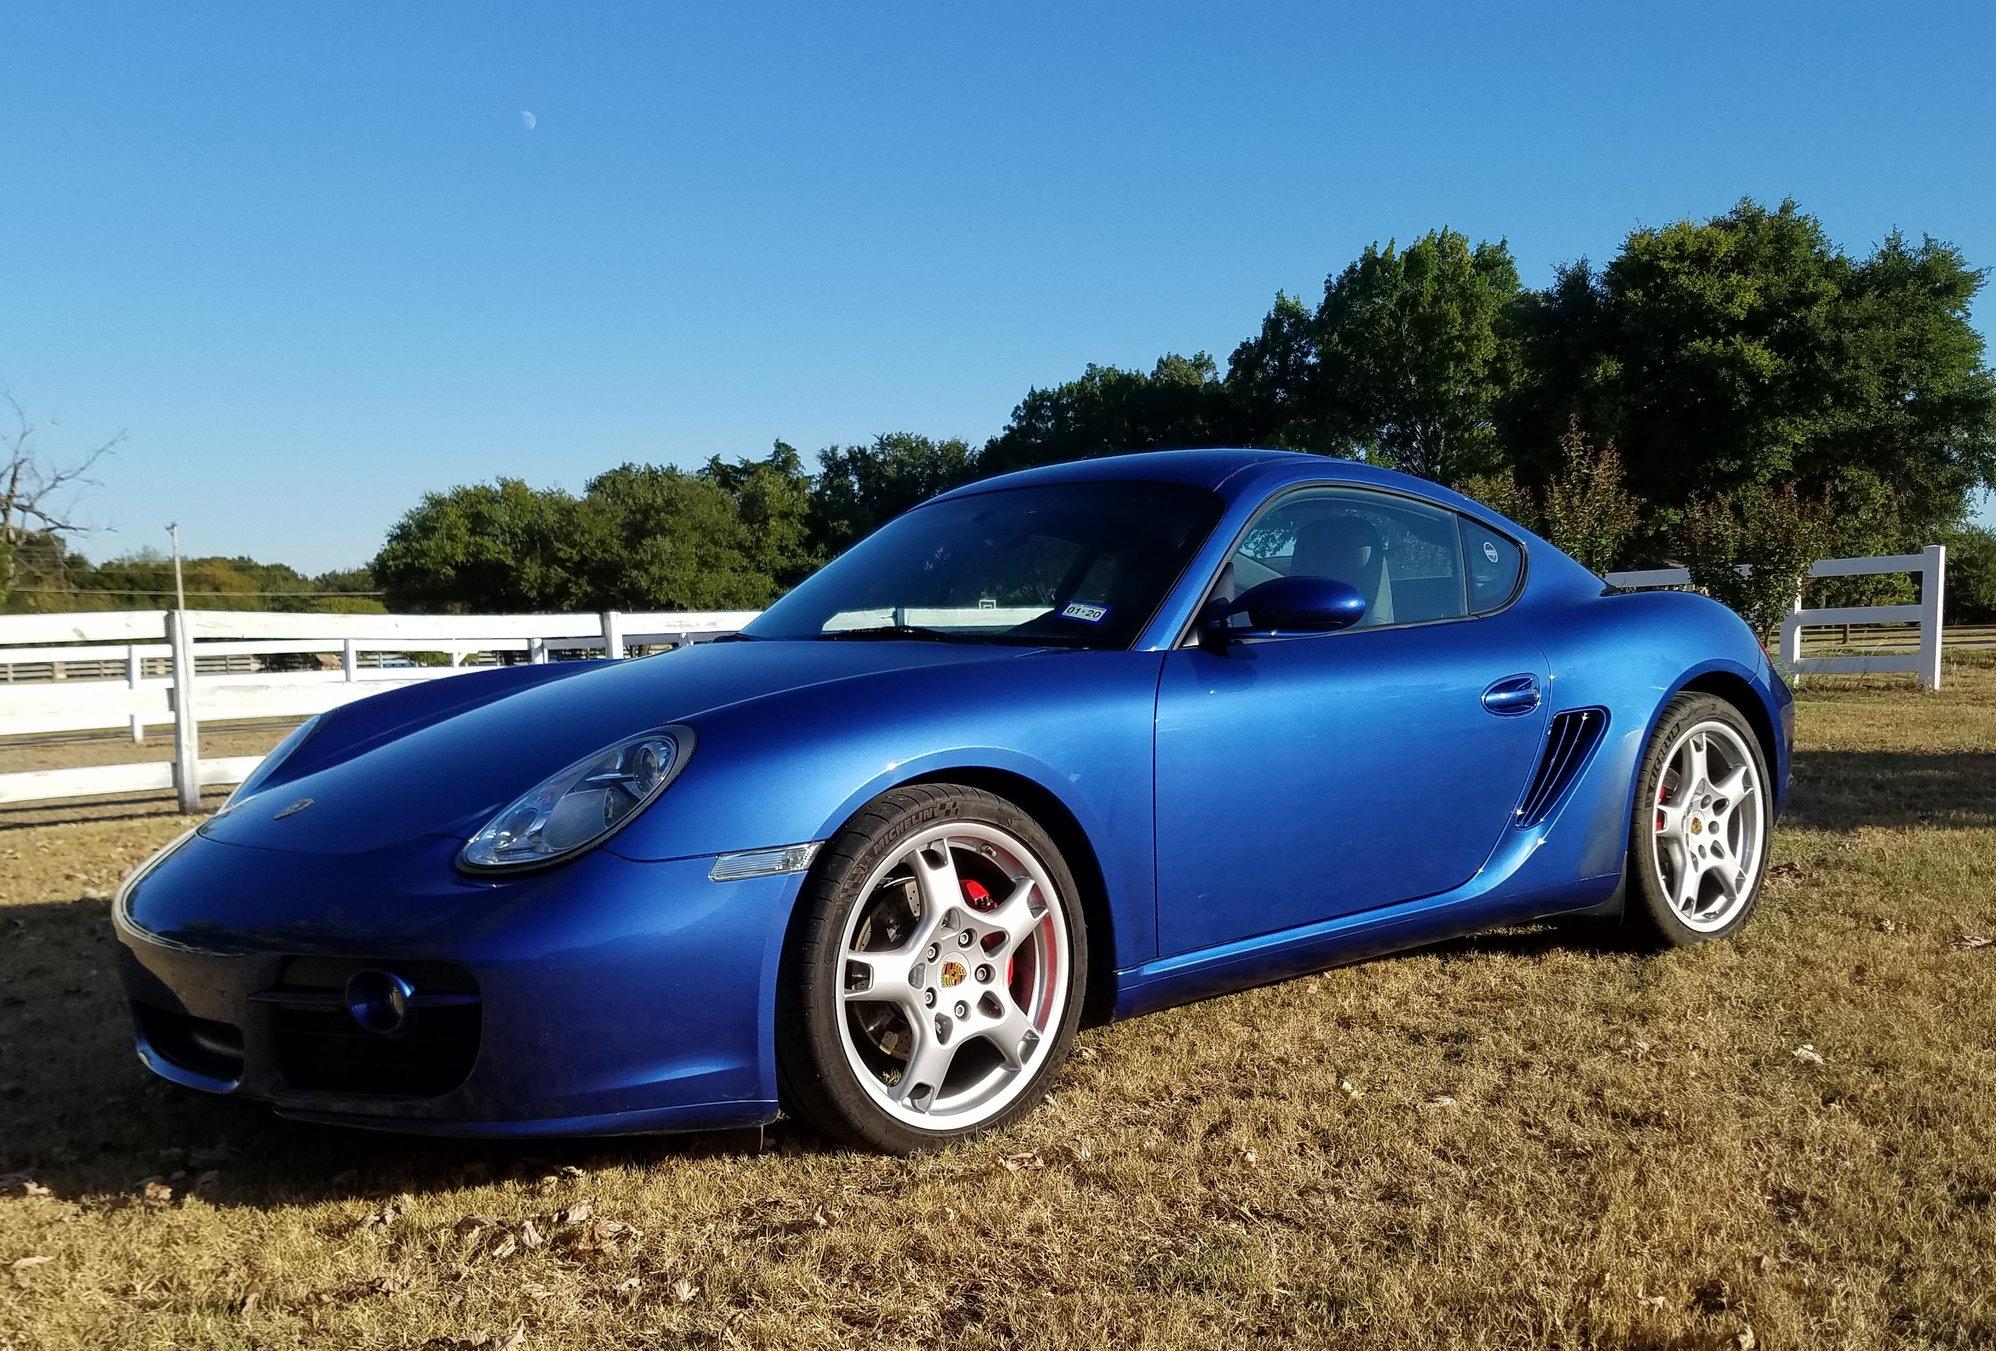 2007 Cayman S Manual In Cobalt Blue Rennlist Porsche Discussion Forums